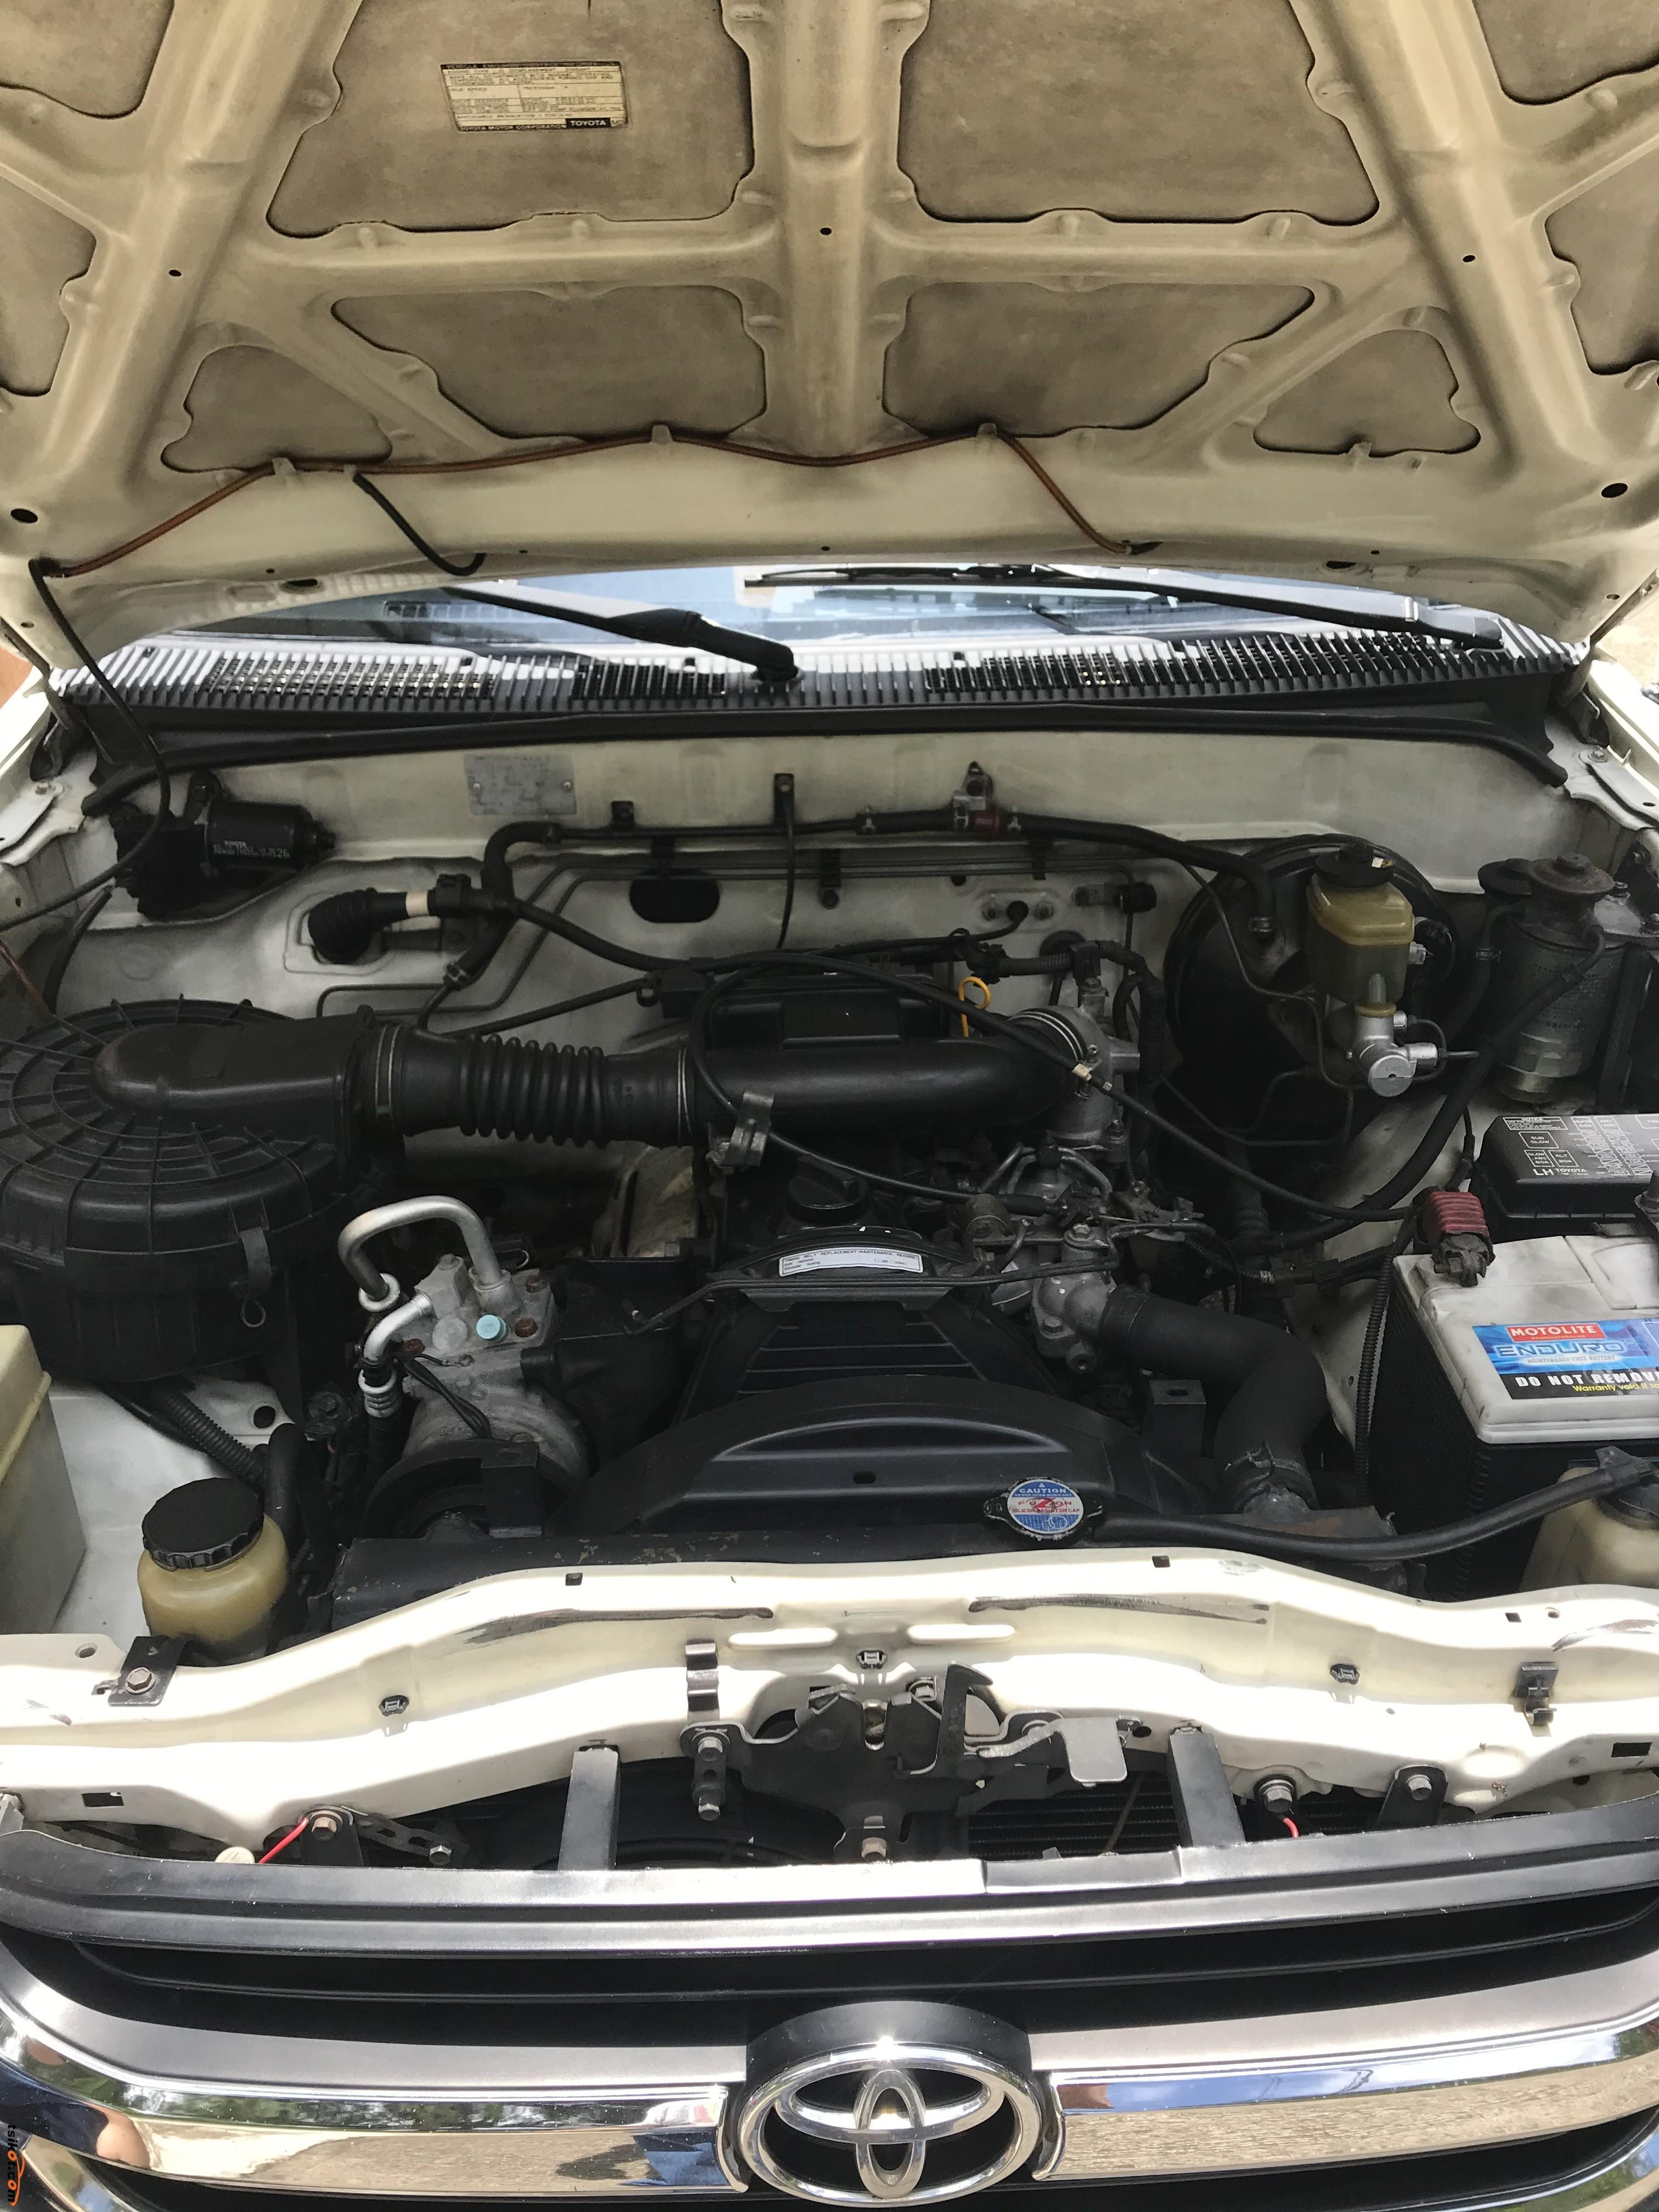 Toyota Hilux 2004 - 2